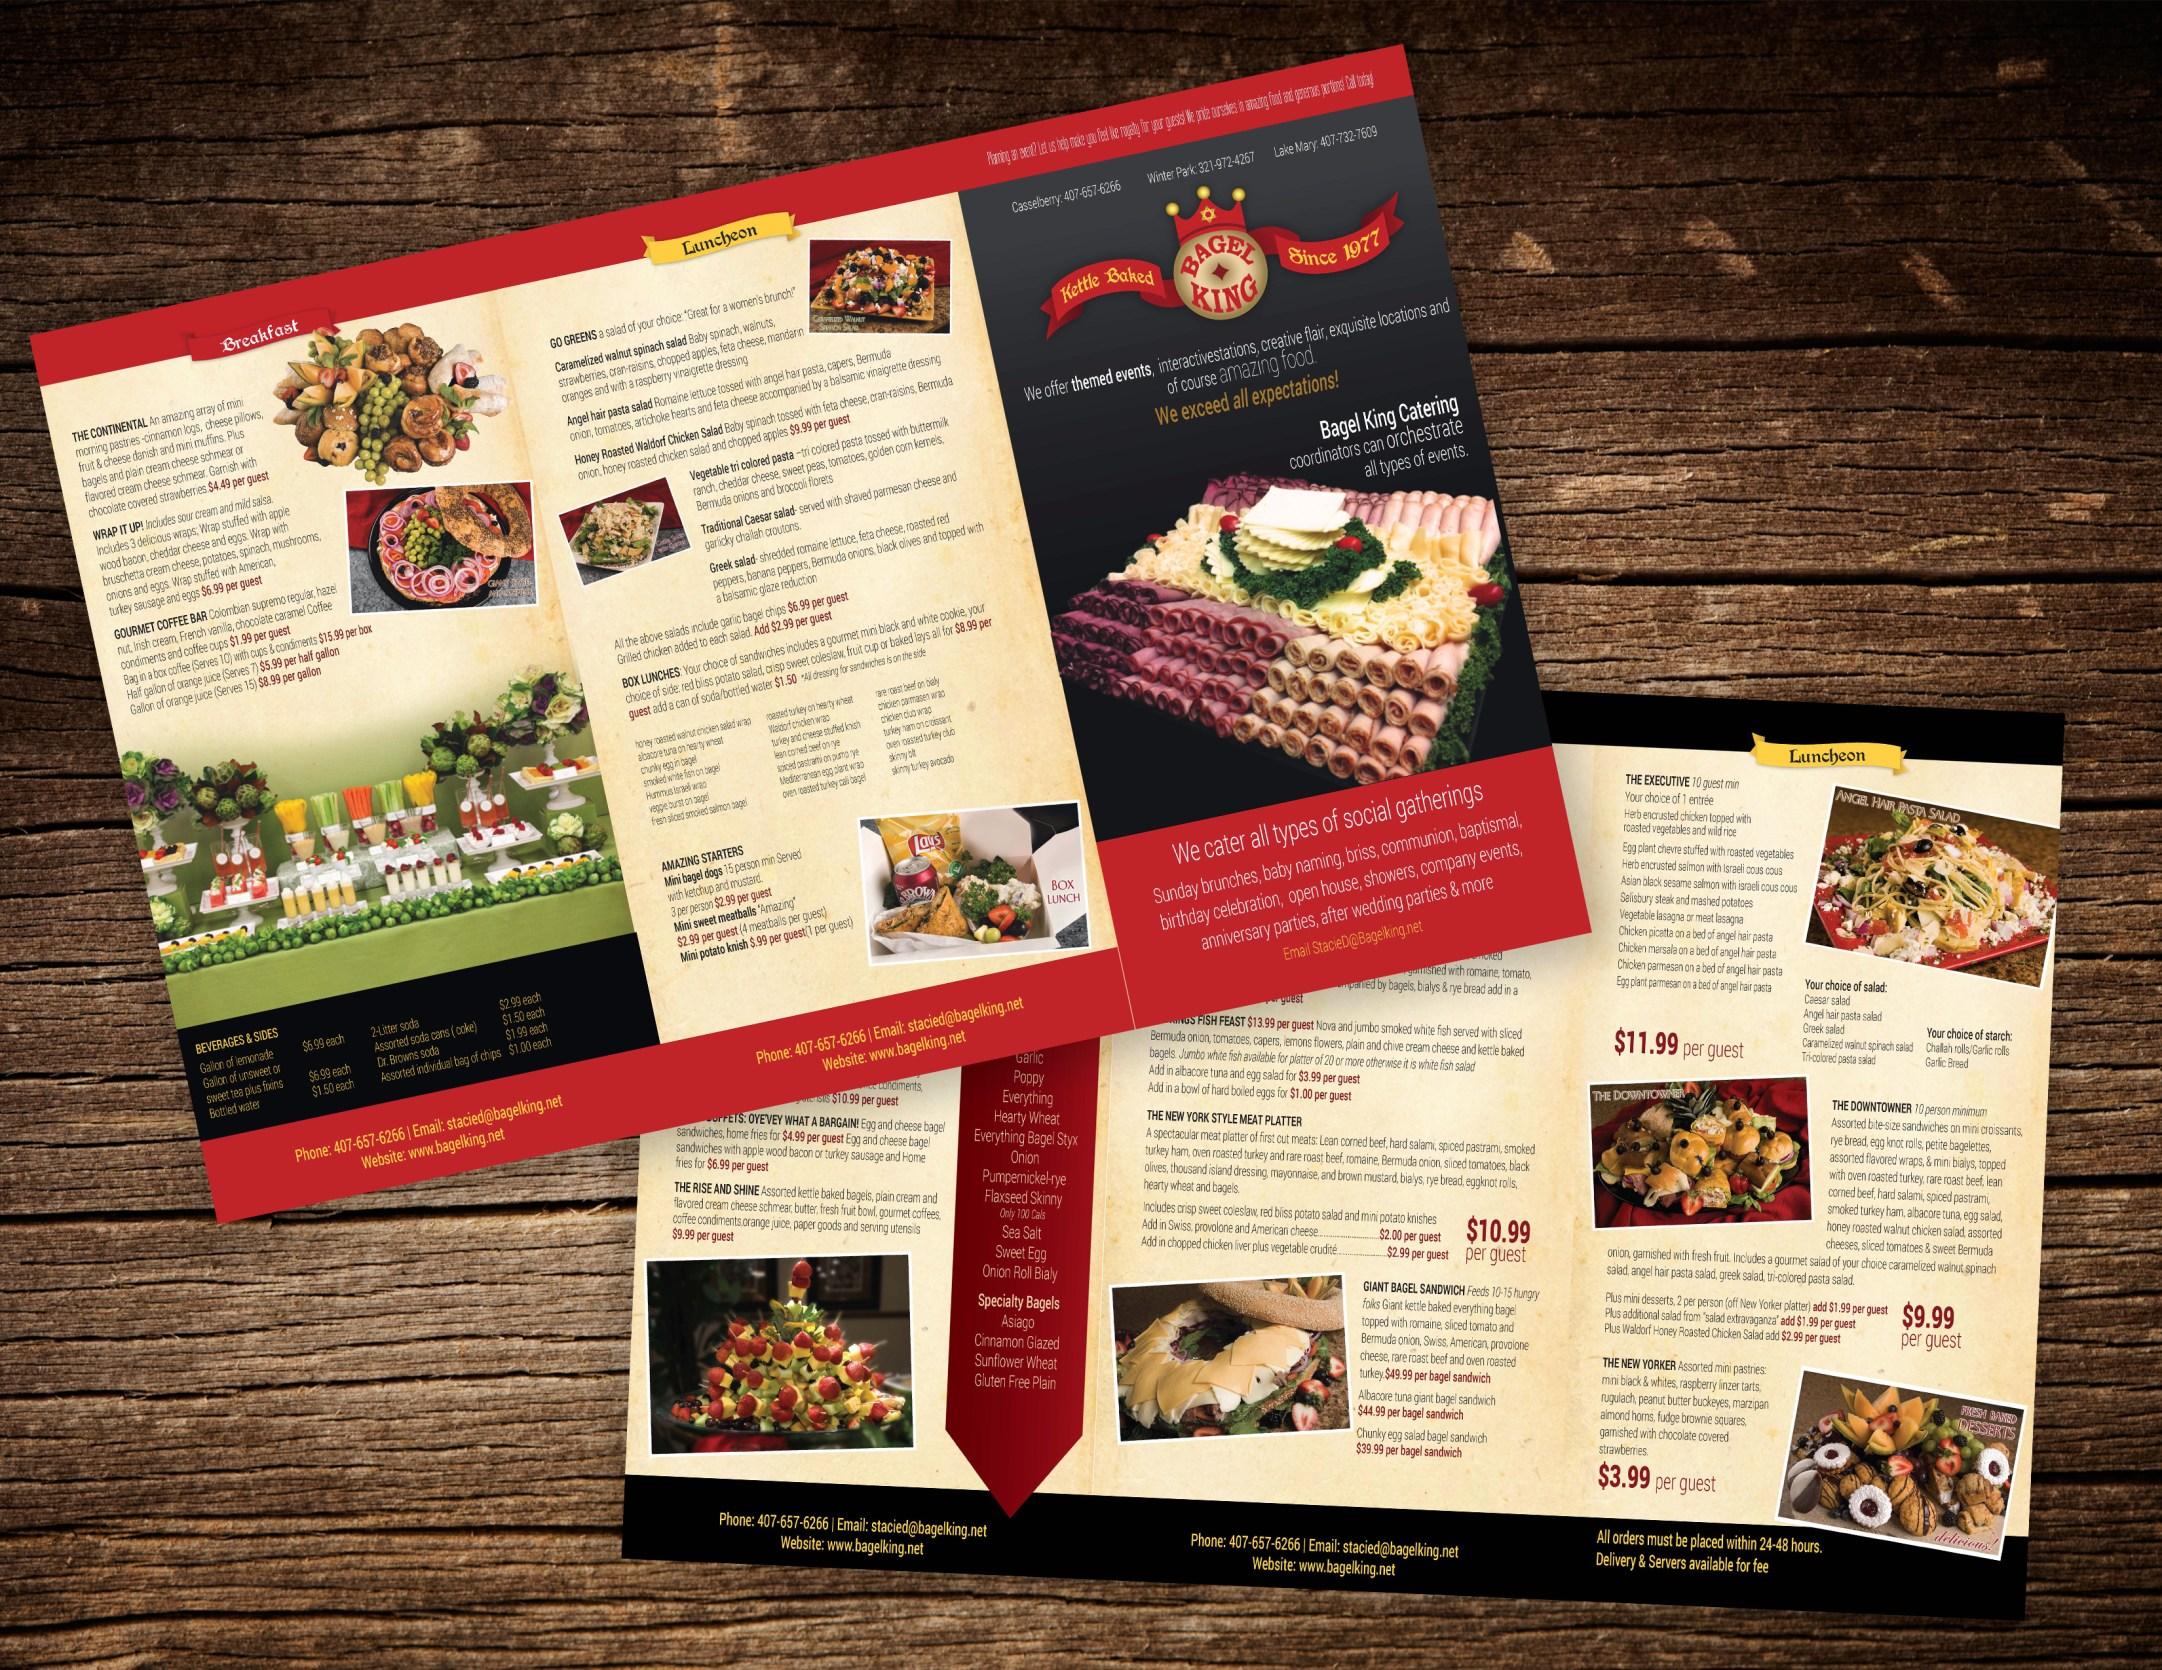 bagel_king_menus